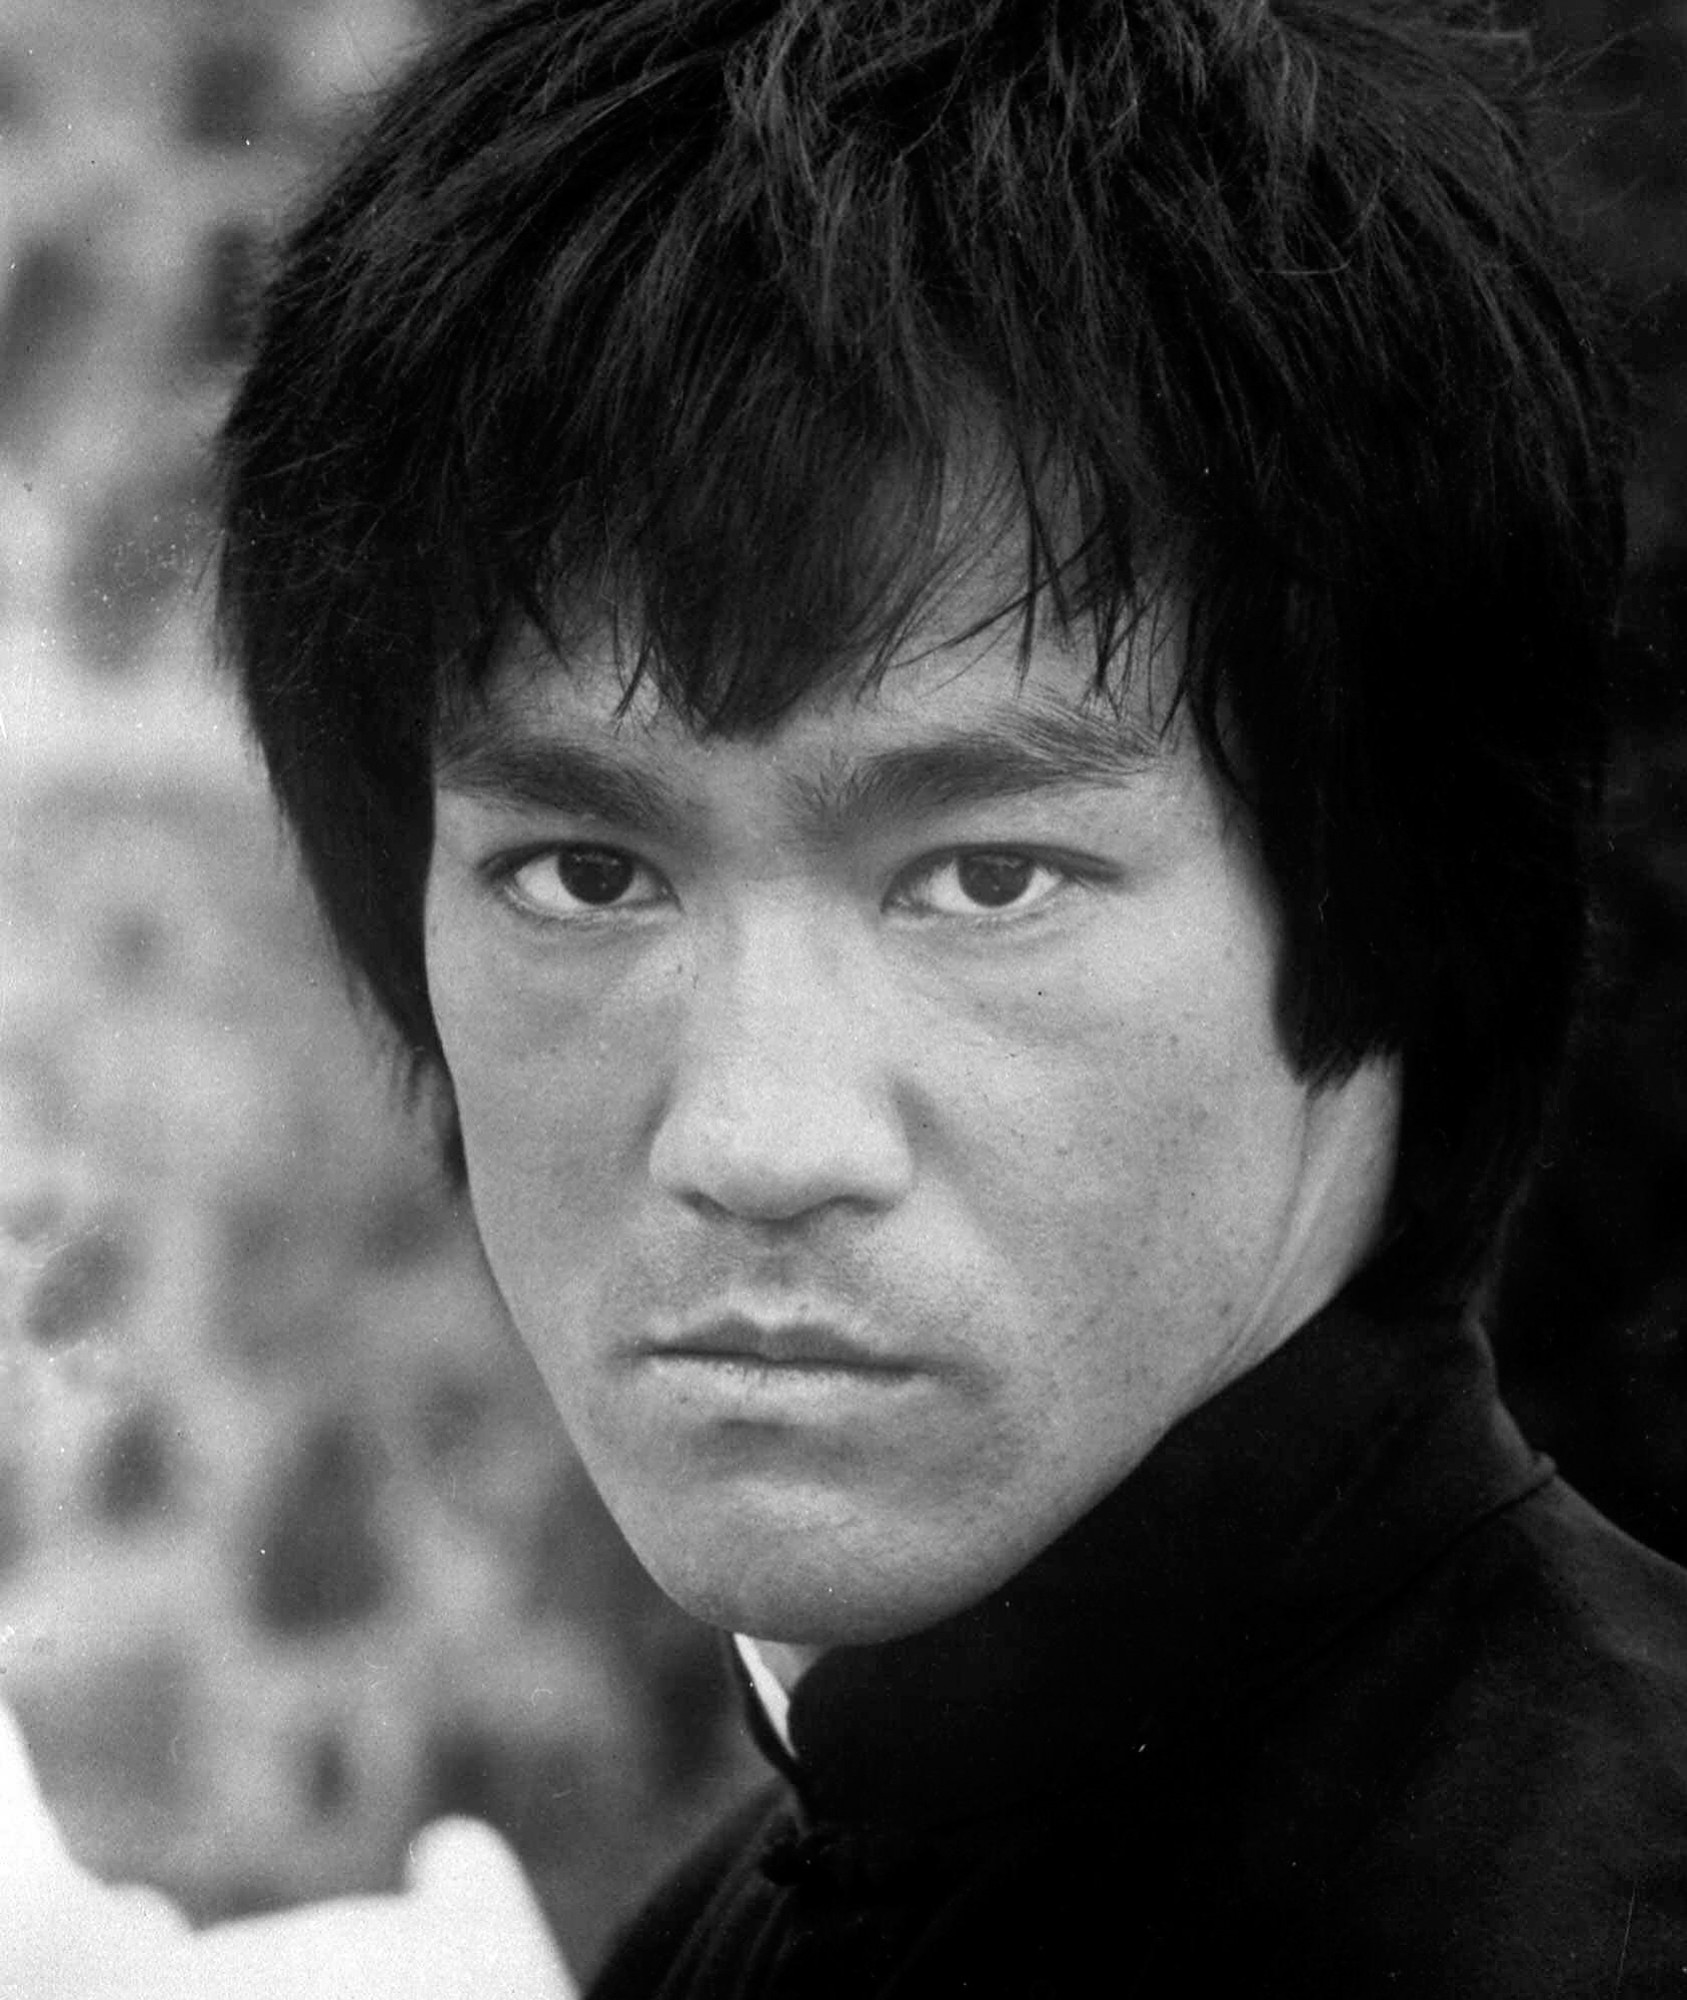 How to build body like bruce lee by munfitnessblog com - How To Build Body Like Bruce Lee By Munfitnessblog Com Zerorex Jeet Kune Do Z Download